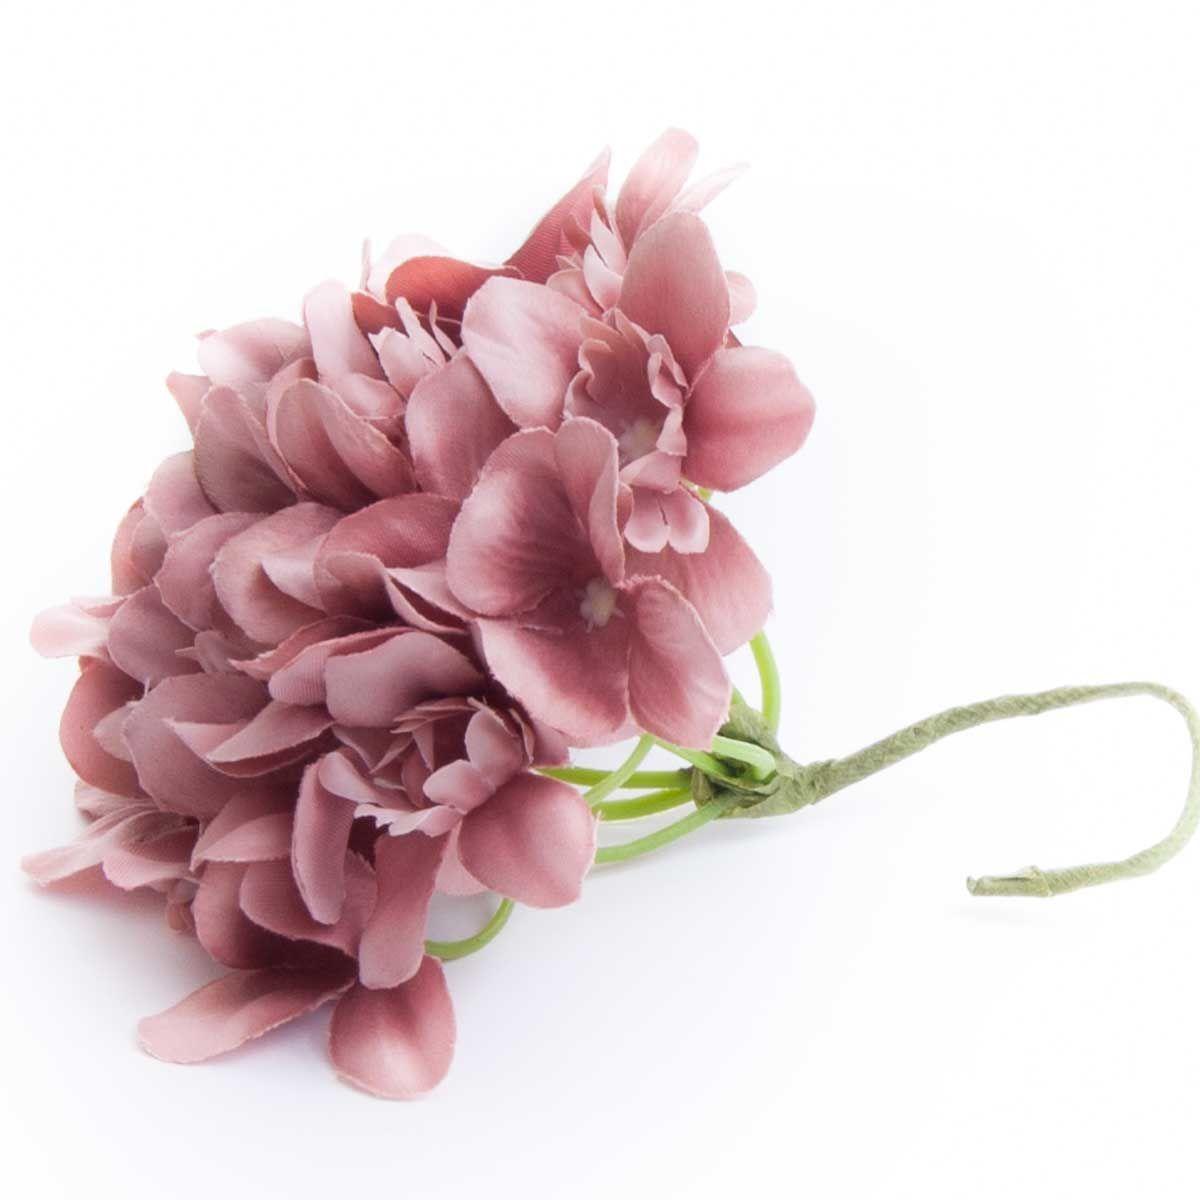 Maria Graor Artisanal Headpiece in Pink